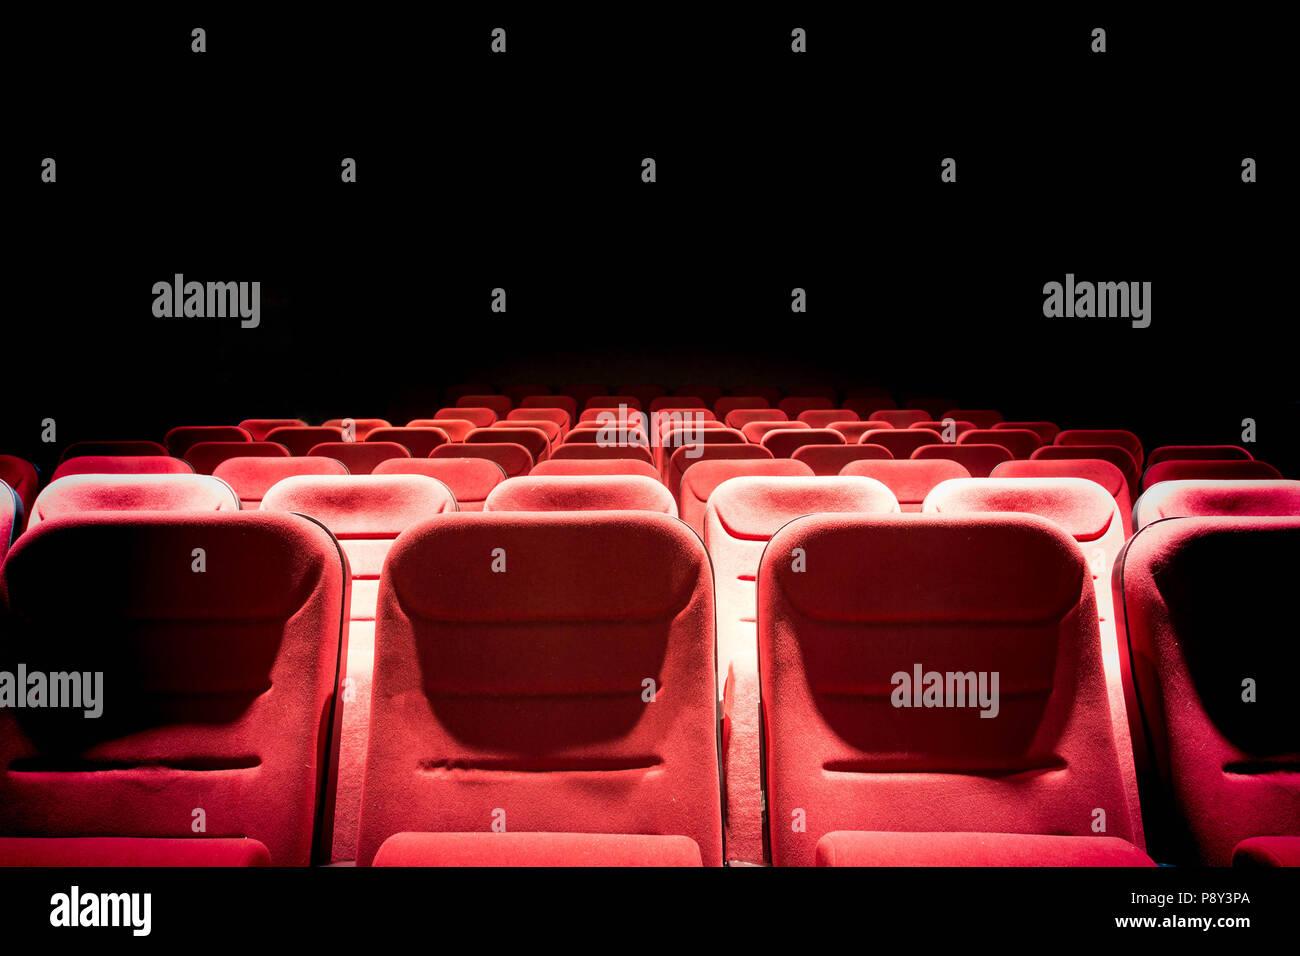 Dunklen Kinosaal mit Projektion, Licht und Leere rote Sitze Stockbild